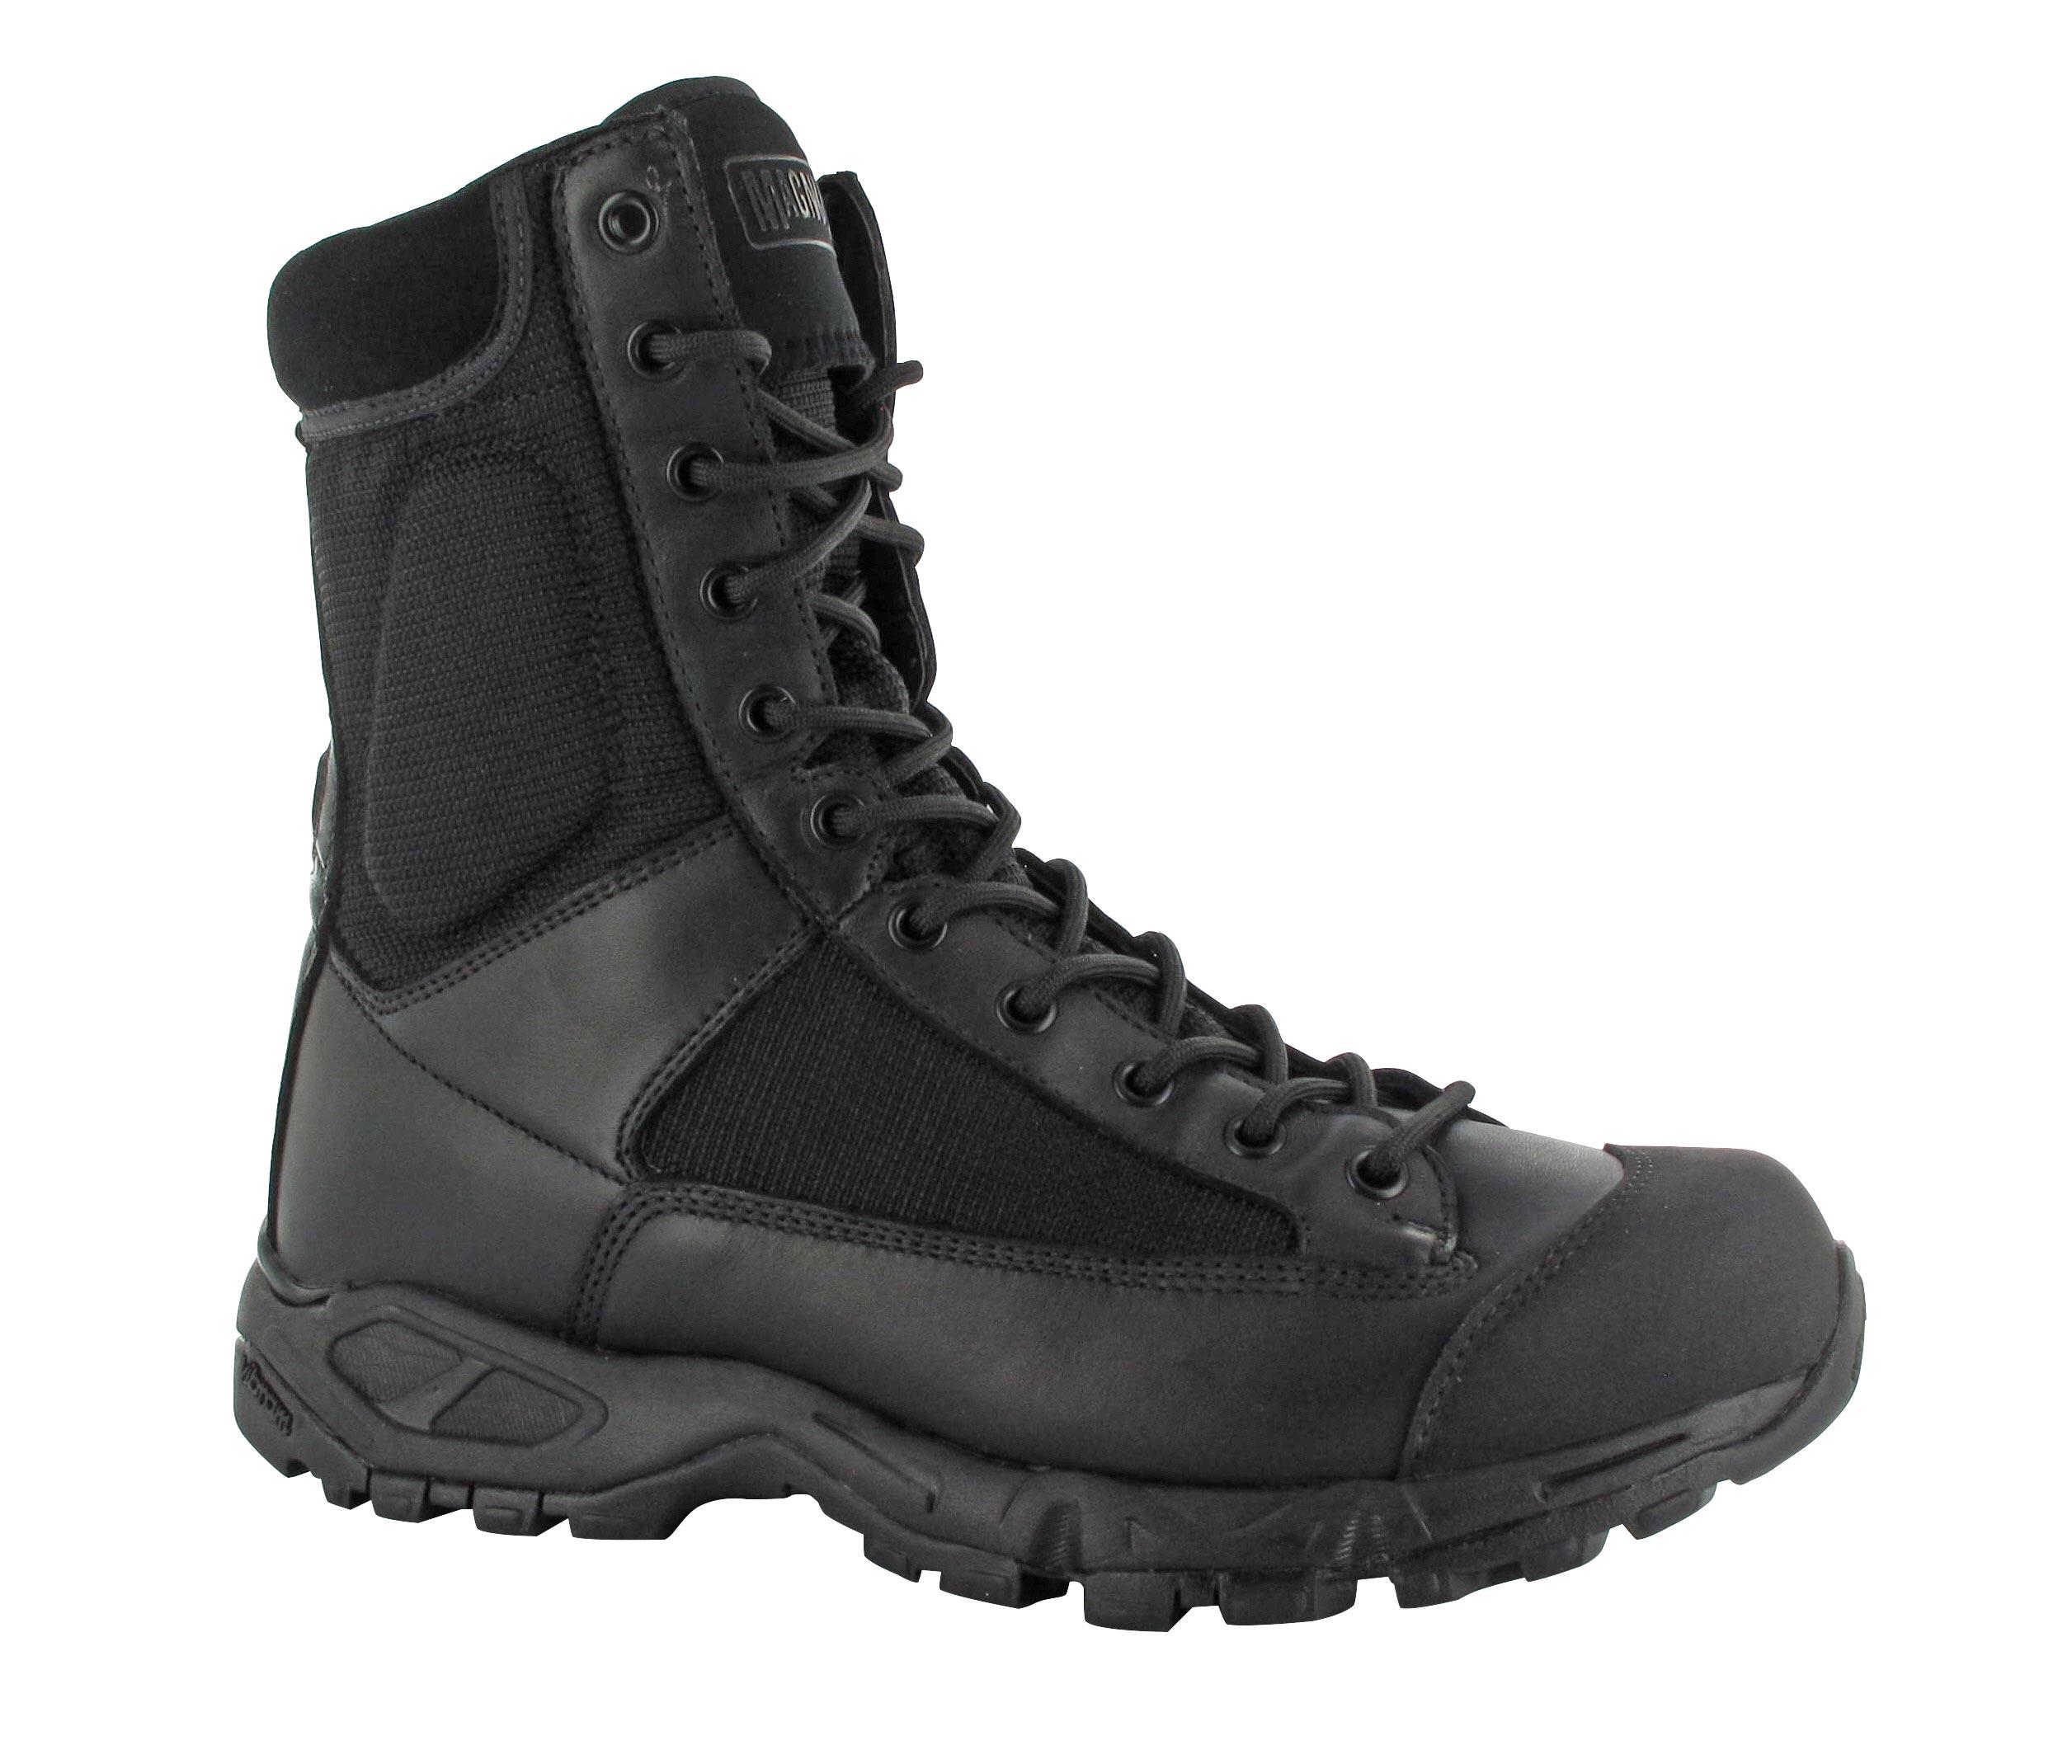 hot sale online 1b87e 084b7 Anfibi Magnum jump boots - Articoli militari - Scarpe e ...